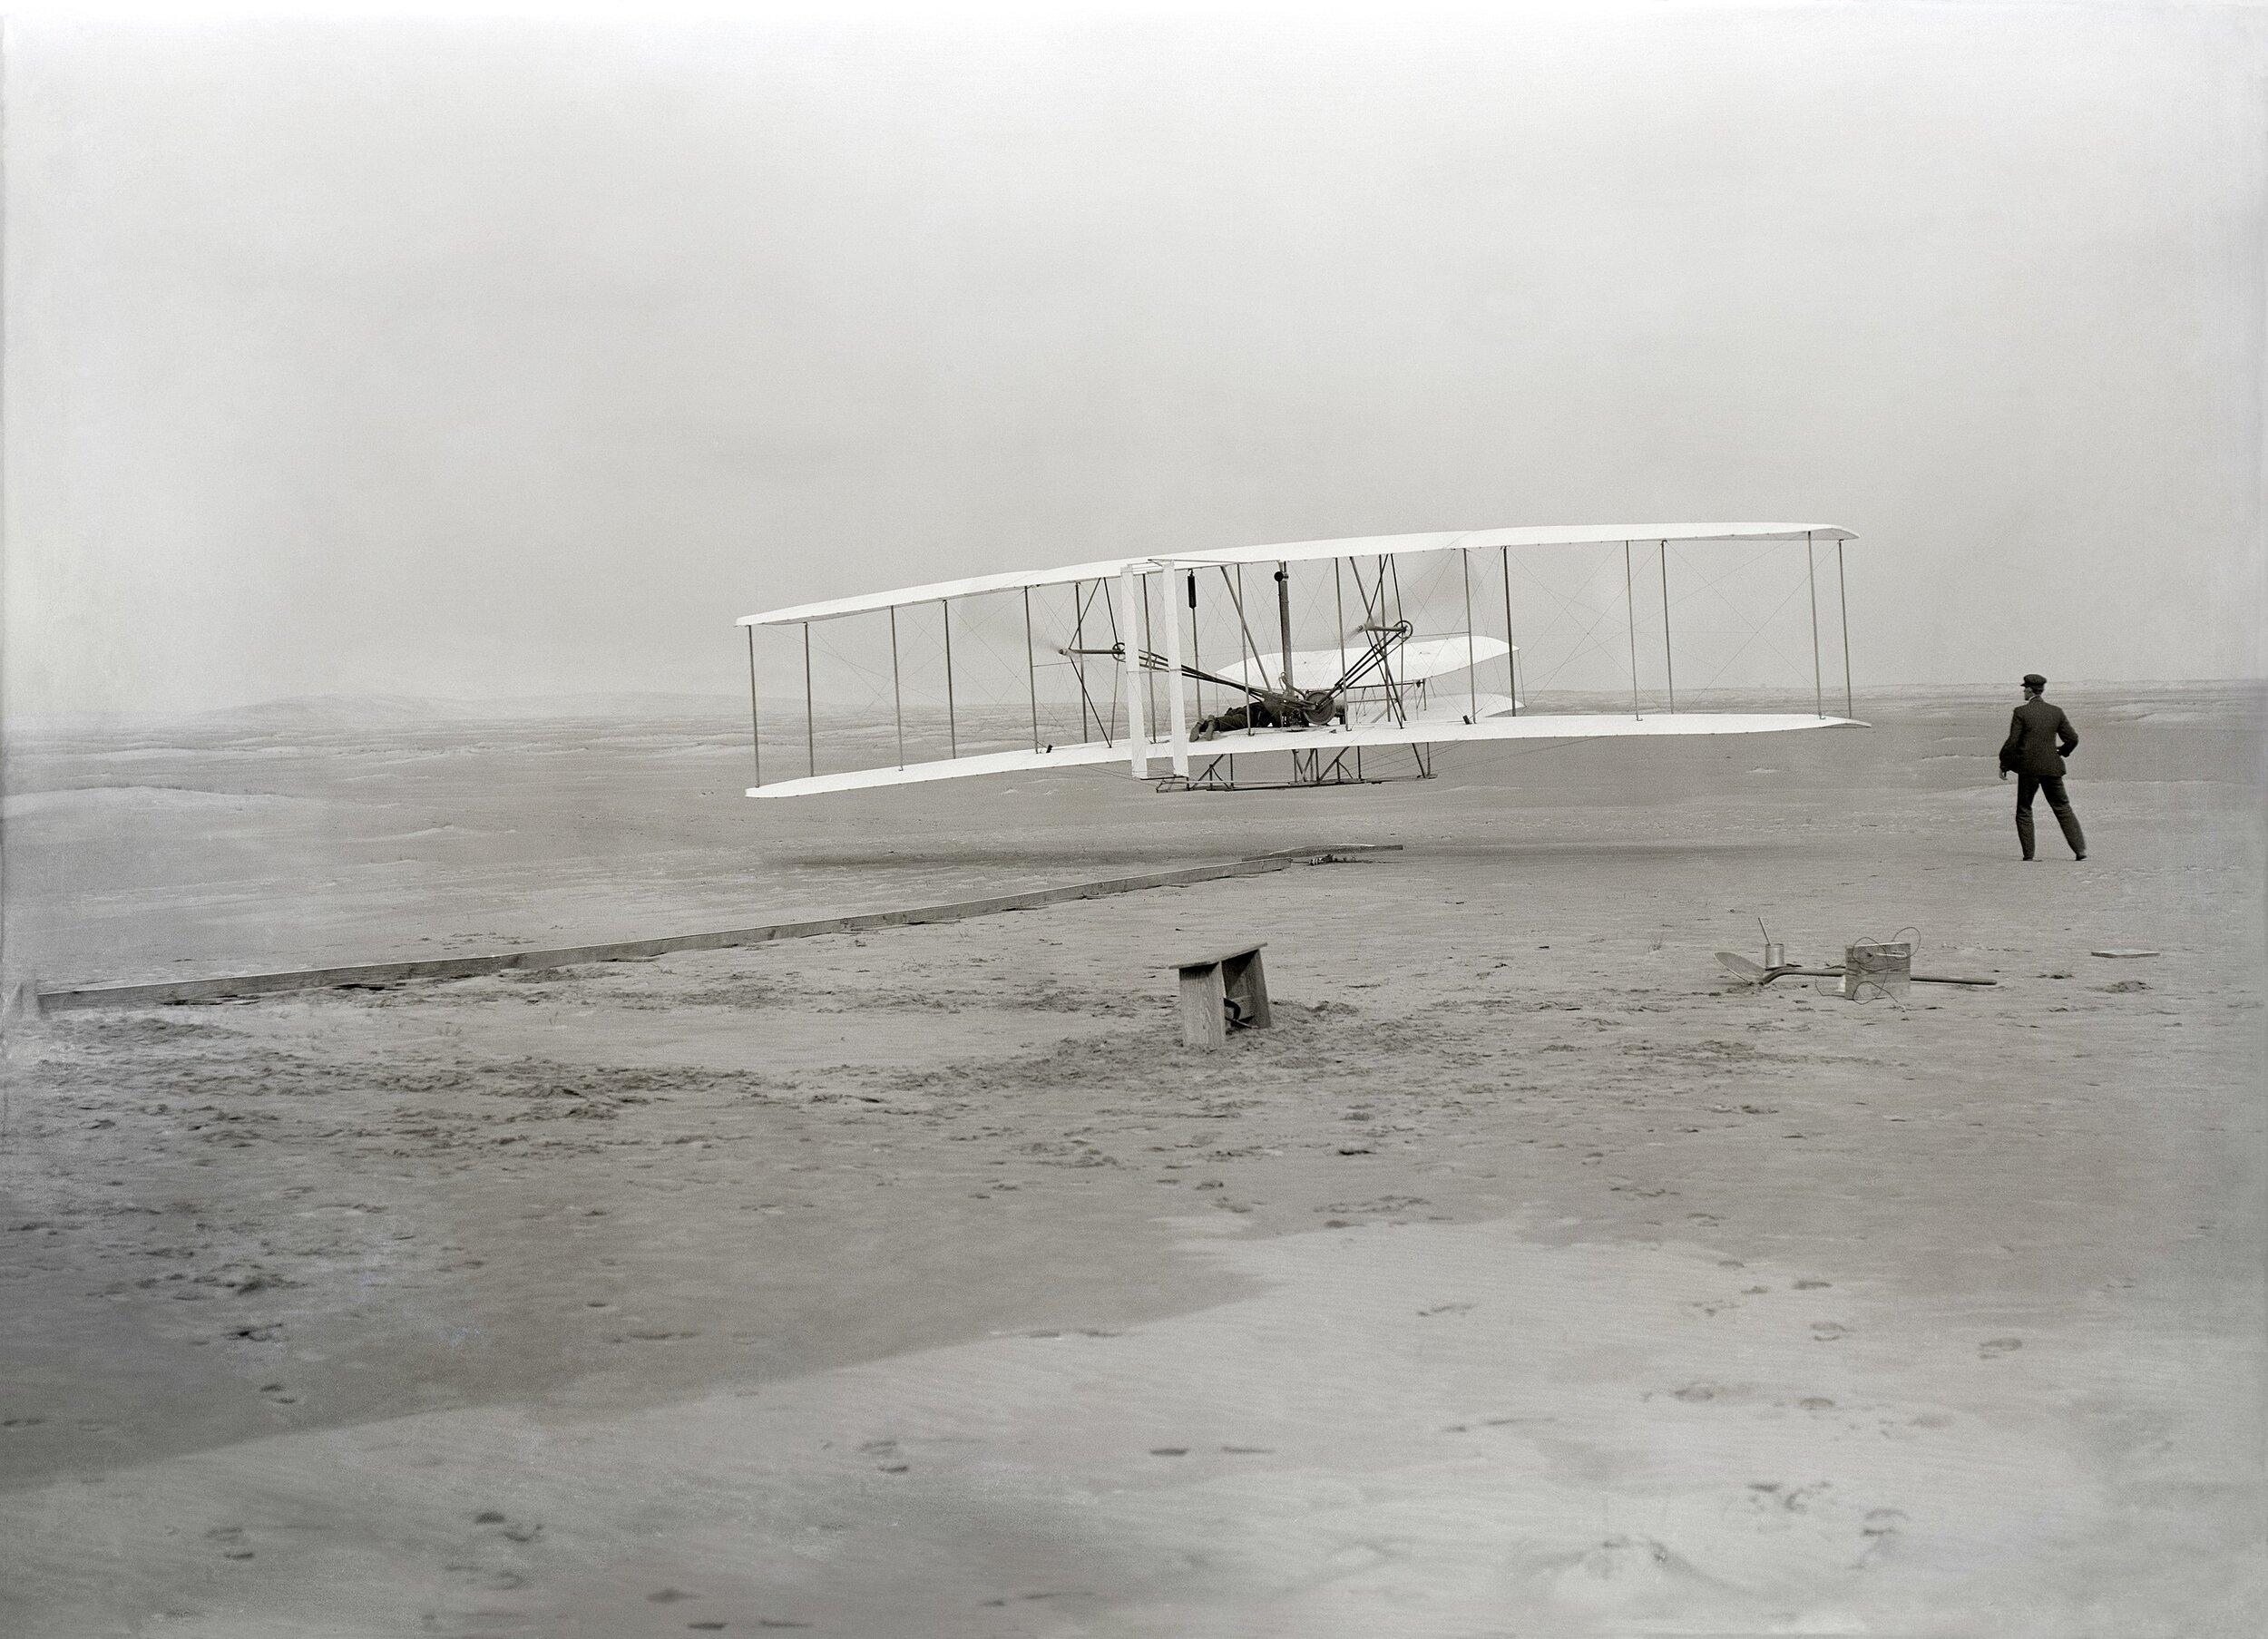 2880px-wright_first_flight_1903dec17_(full_restore_115).jpg